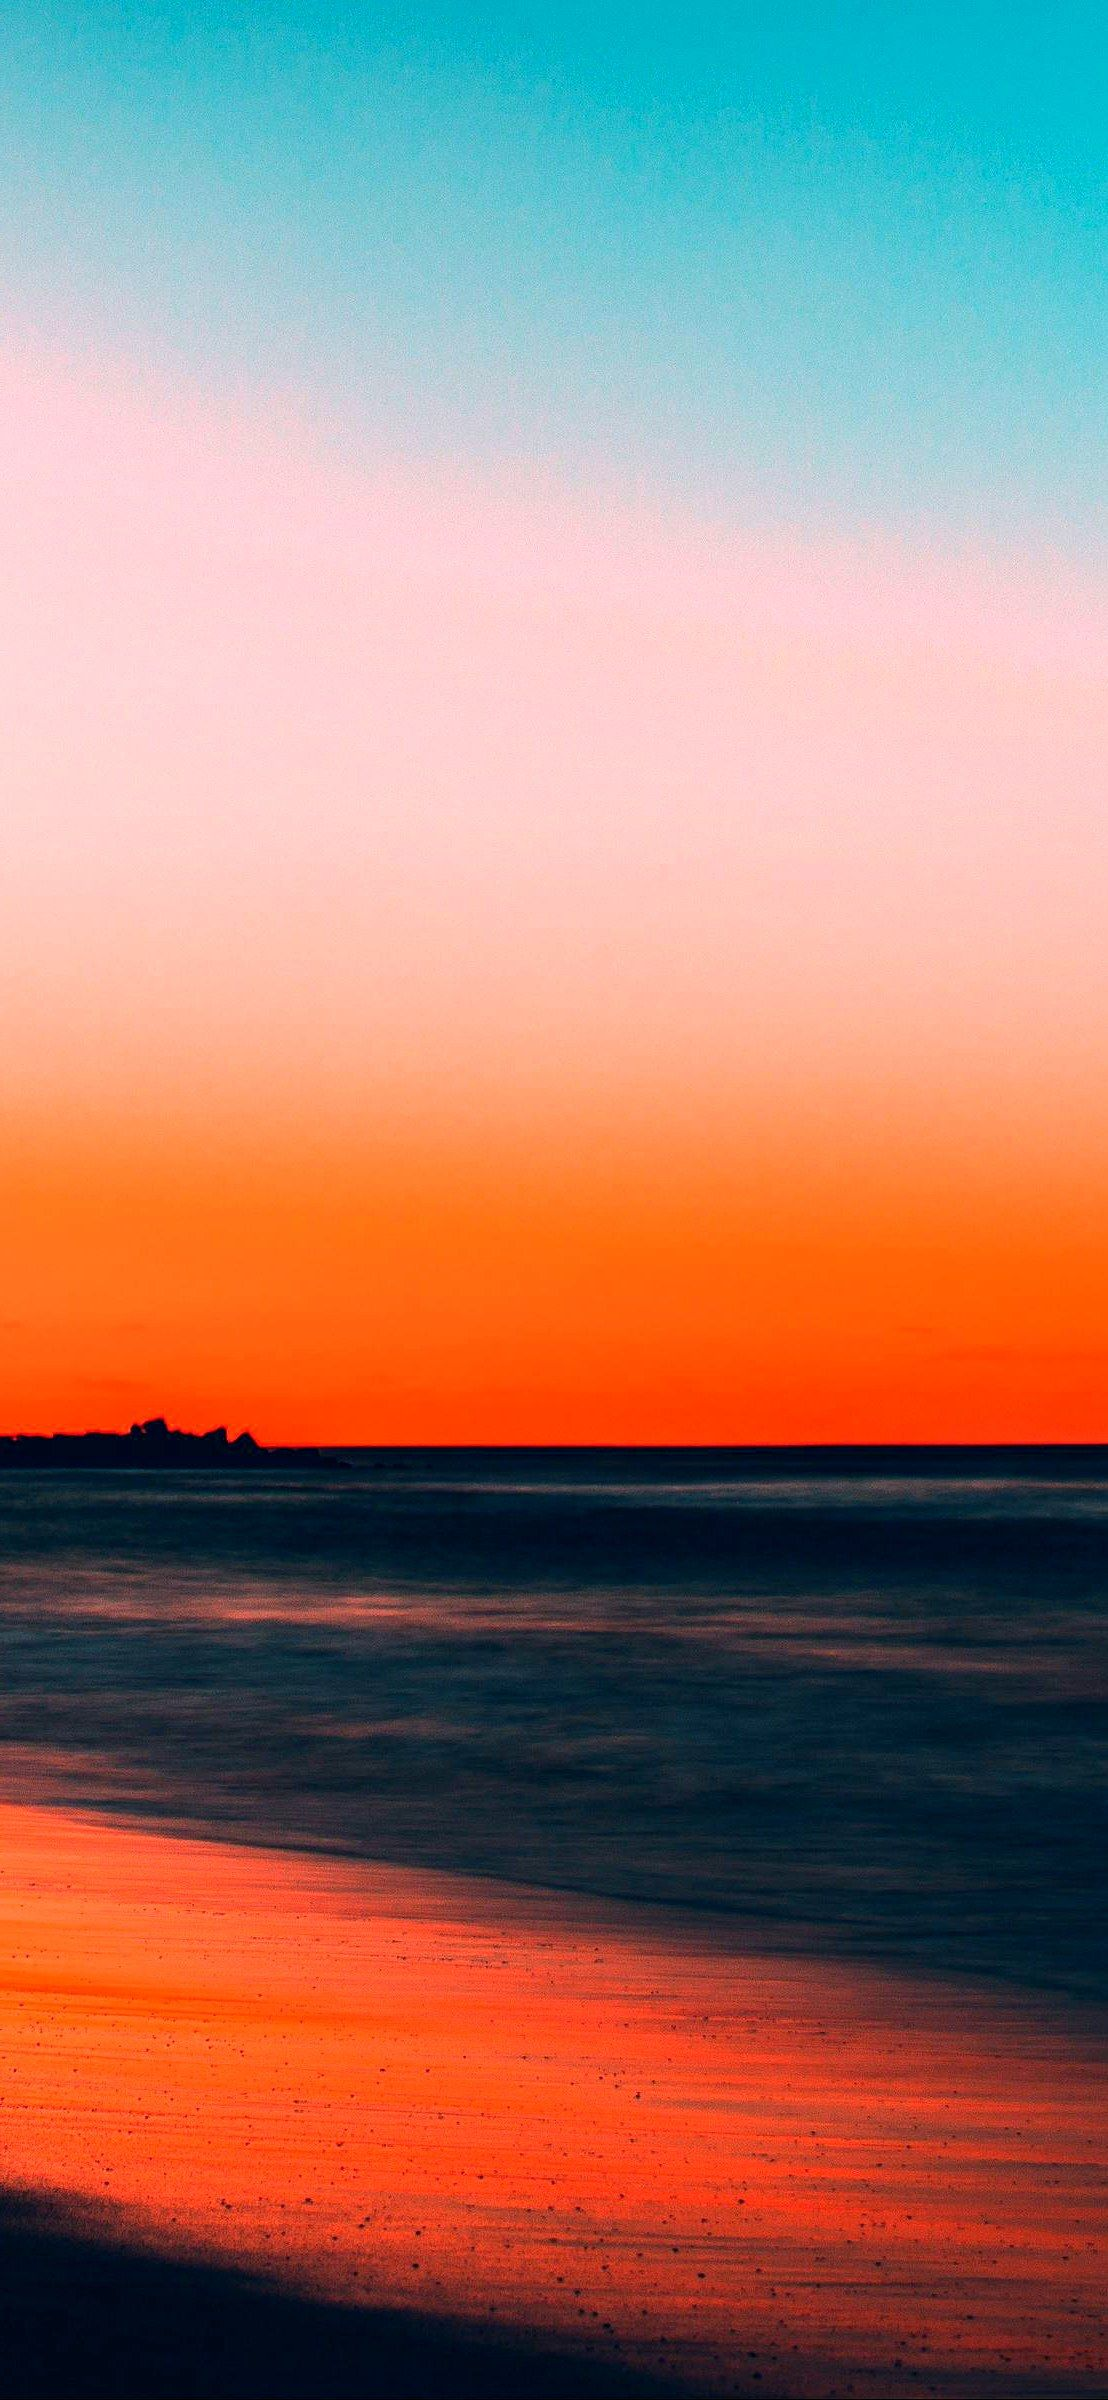 Iphone X Wallpaper Sea Shore Sunset Sky Hd Sunset Sky Sunset Wallpaper Forest Wallpaper Iphone Wallpaper house ocean sea sky sunset